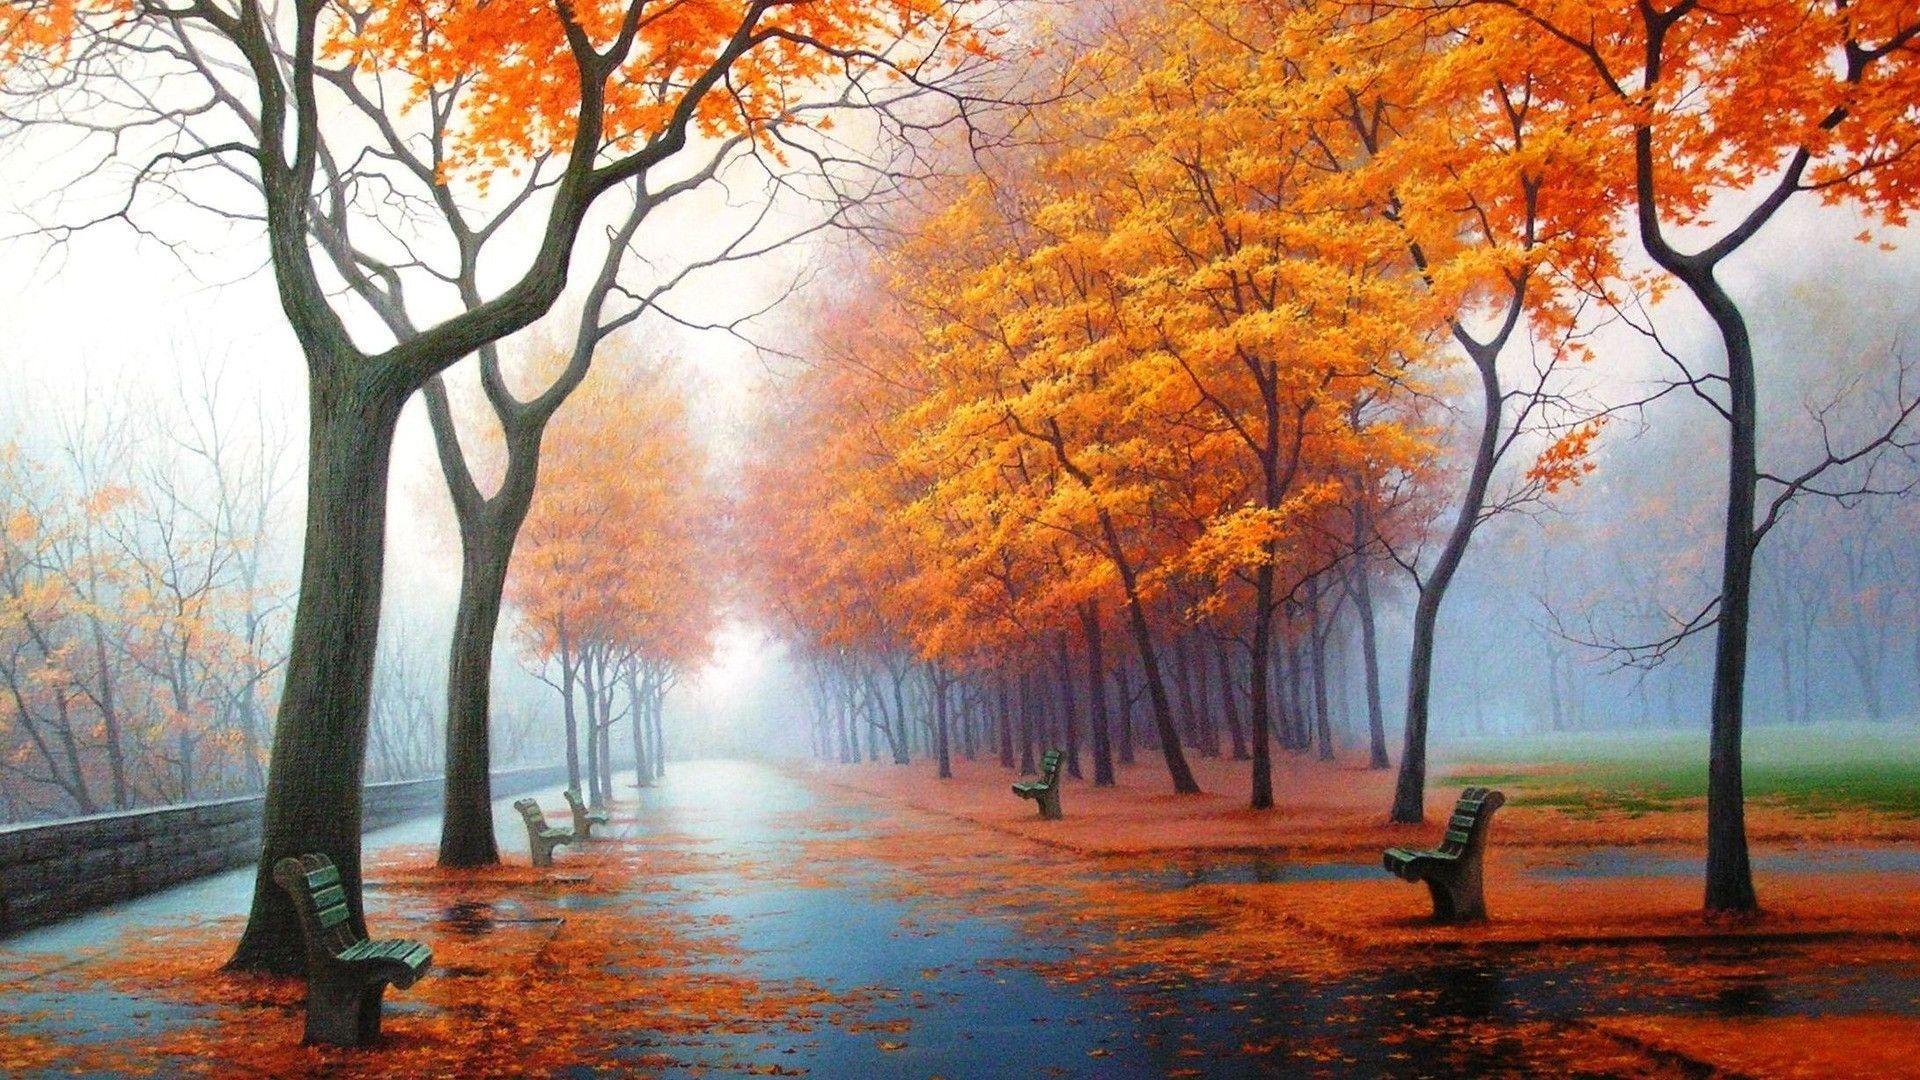 Autumn Desktop Wallpapers Top Free Autumn Desktop